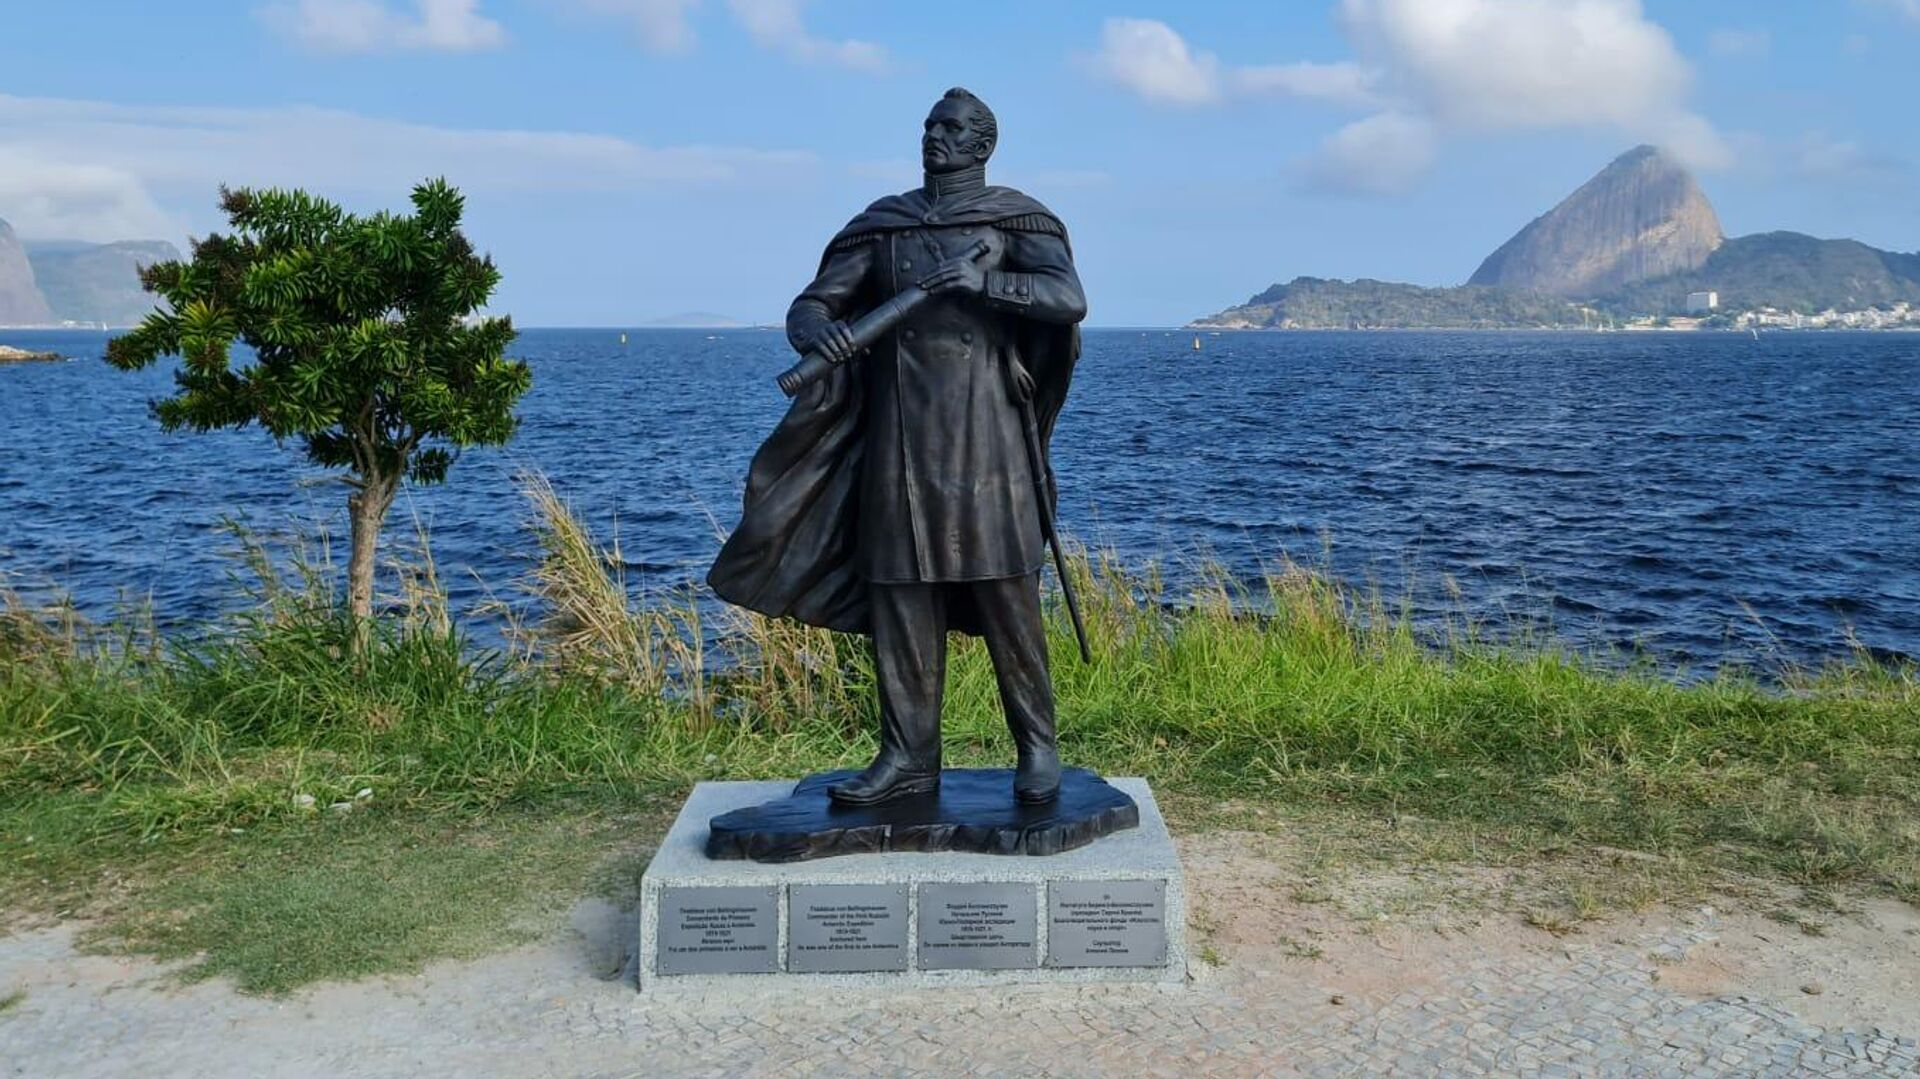 Estatua en homenaje al ruso Fadéi Bellingshausen en Río de Janeiro - Sputnik Mundo, 1920, 30.09.2021